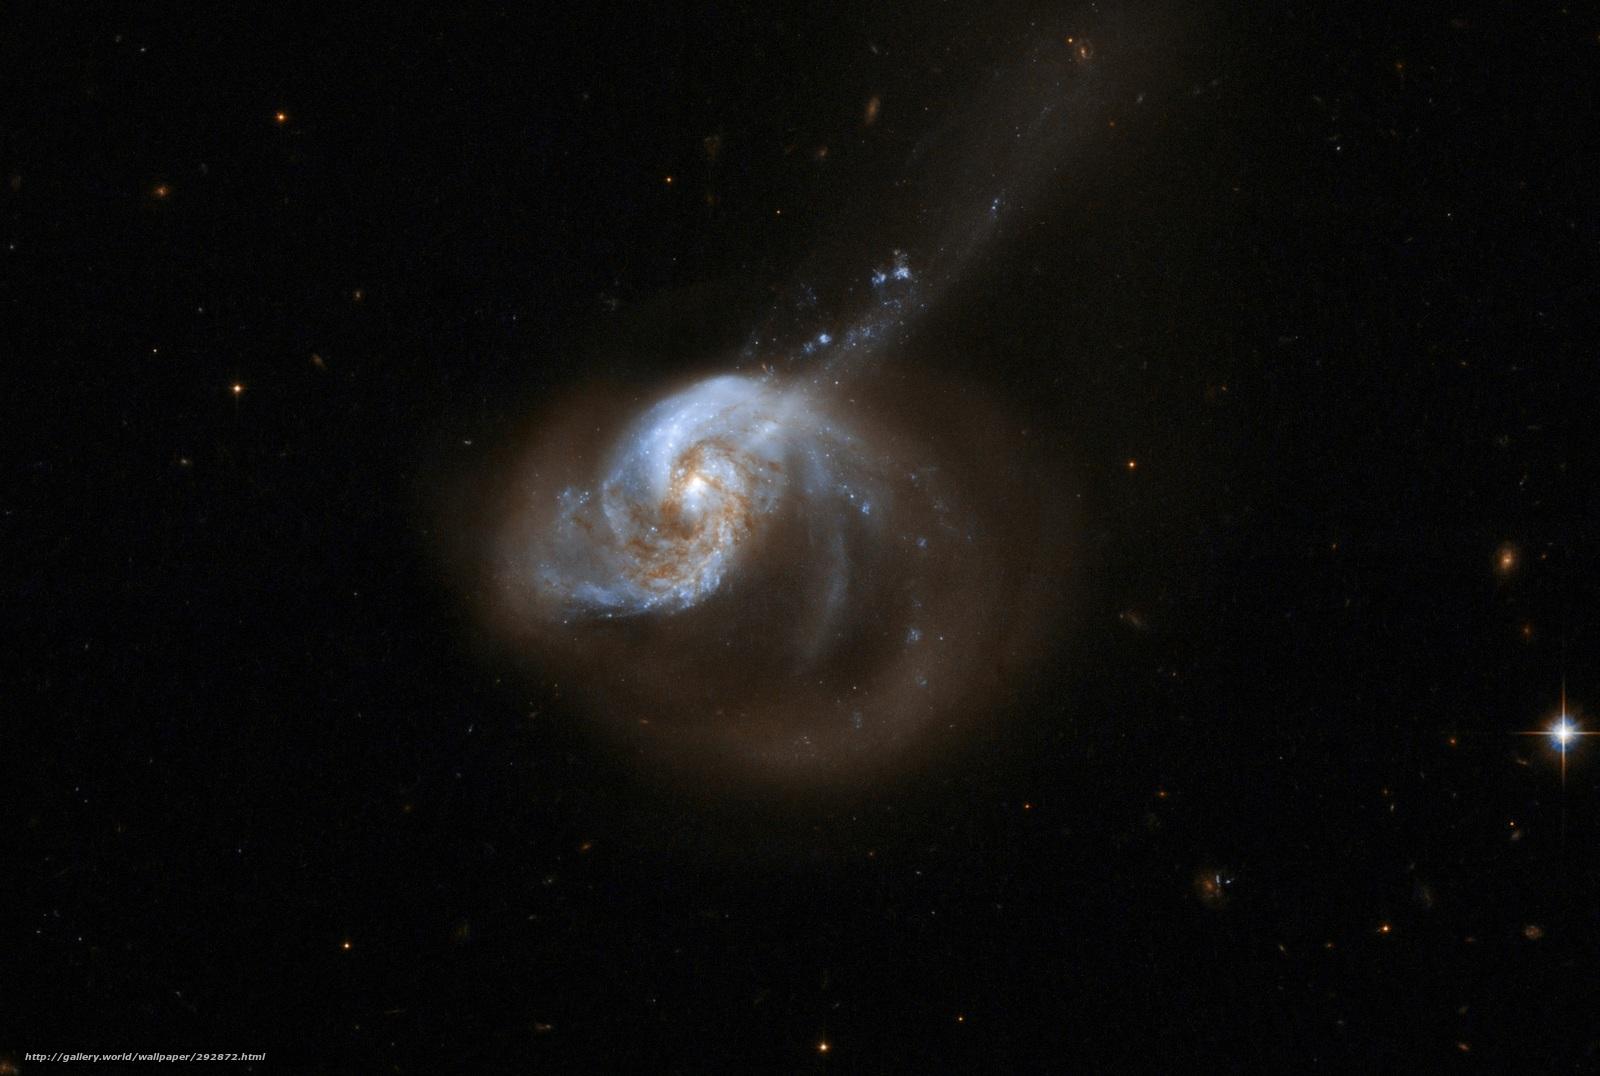 nasa high res galaxy wallpaper - photo #24